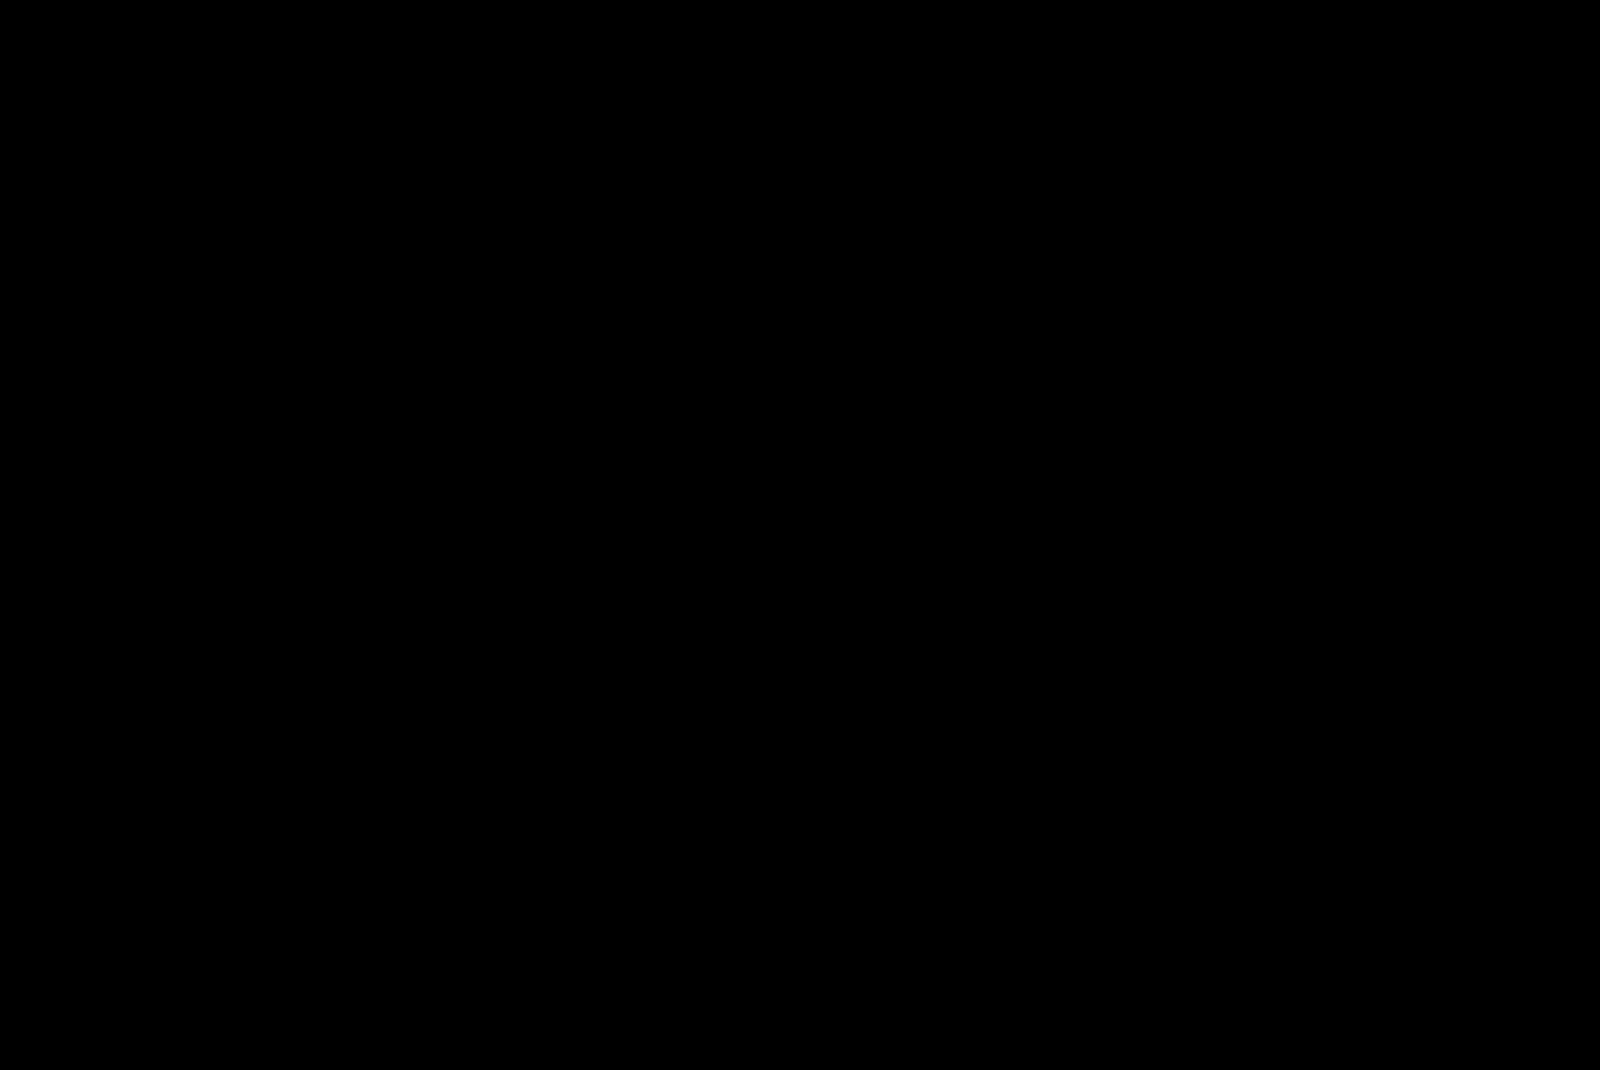 Tapatia